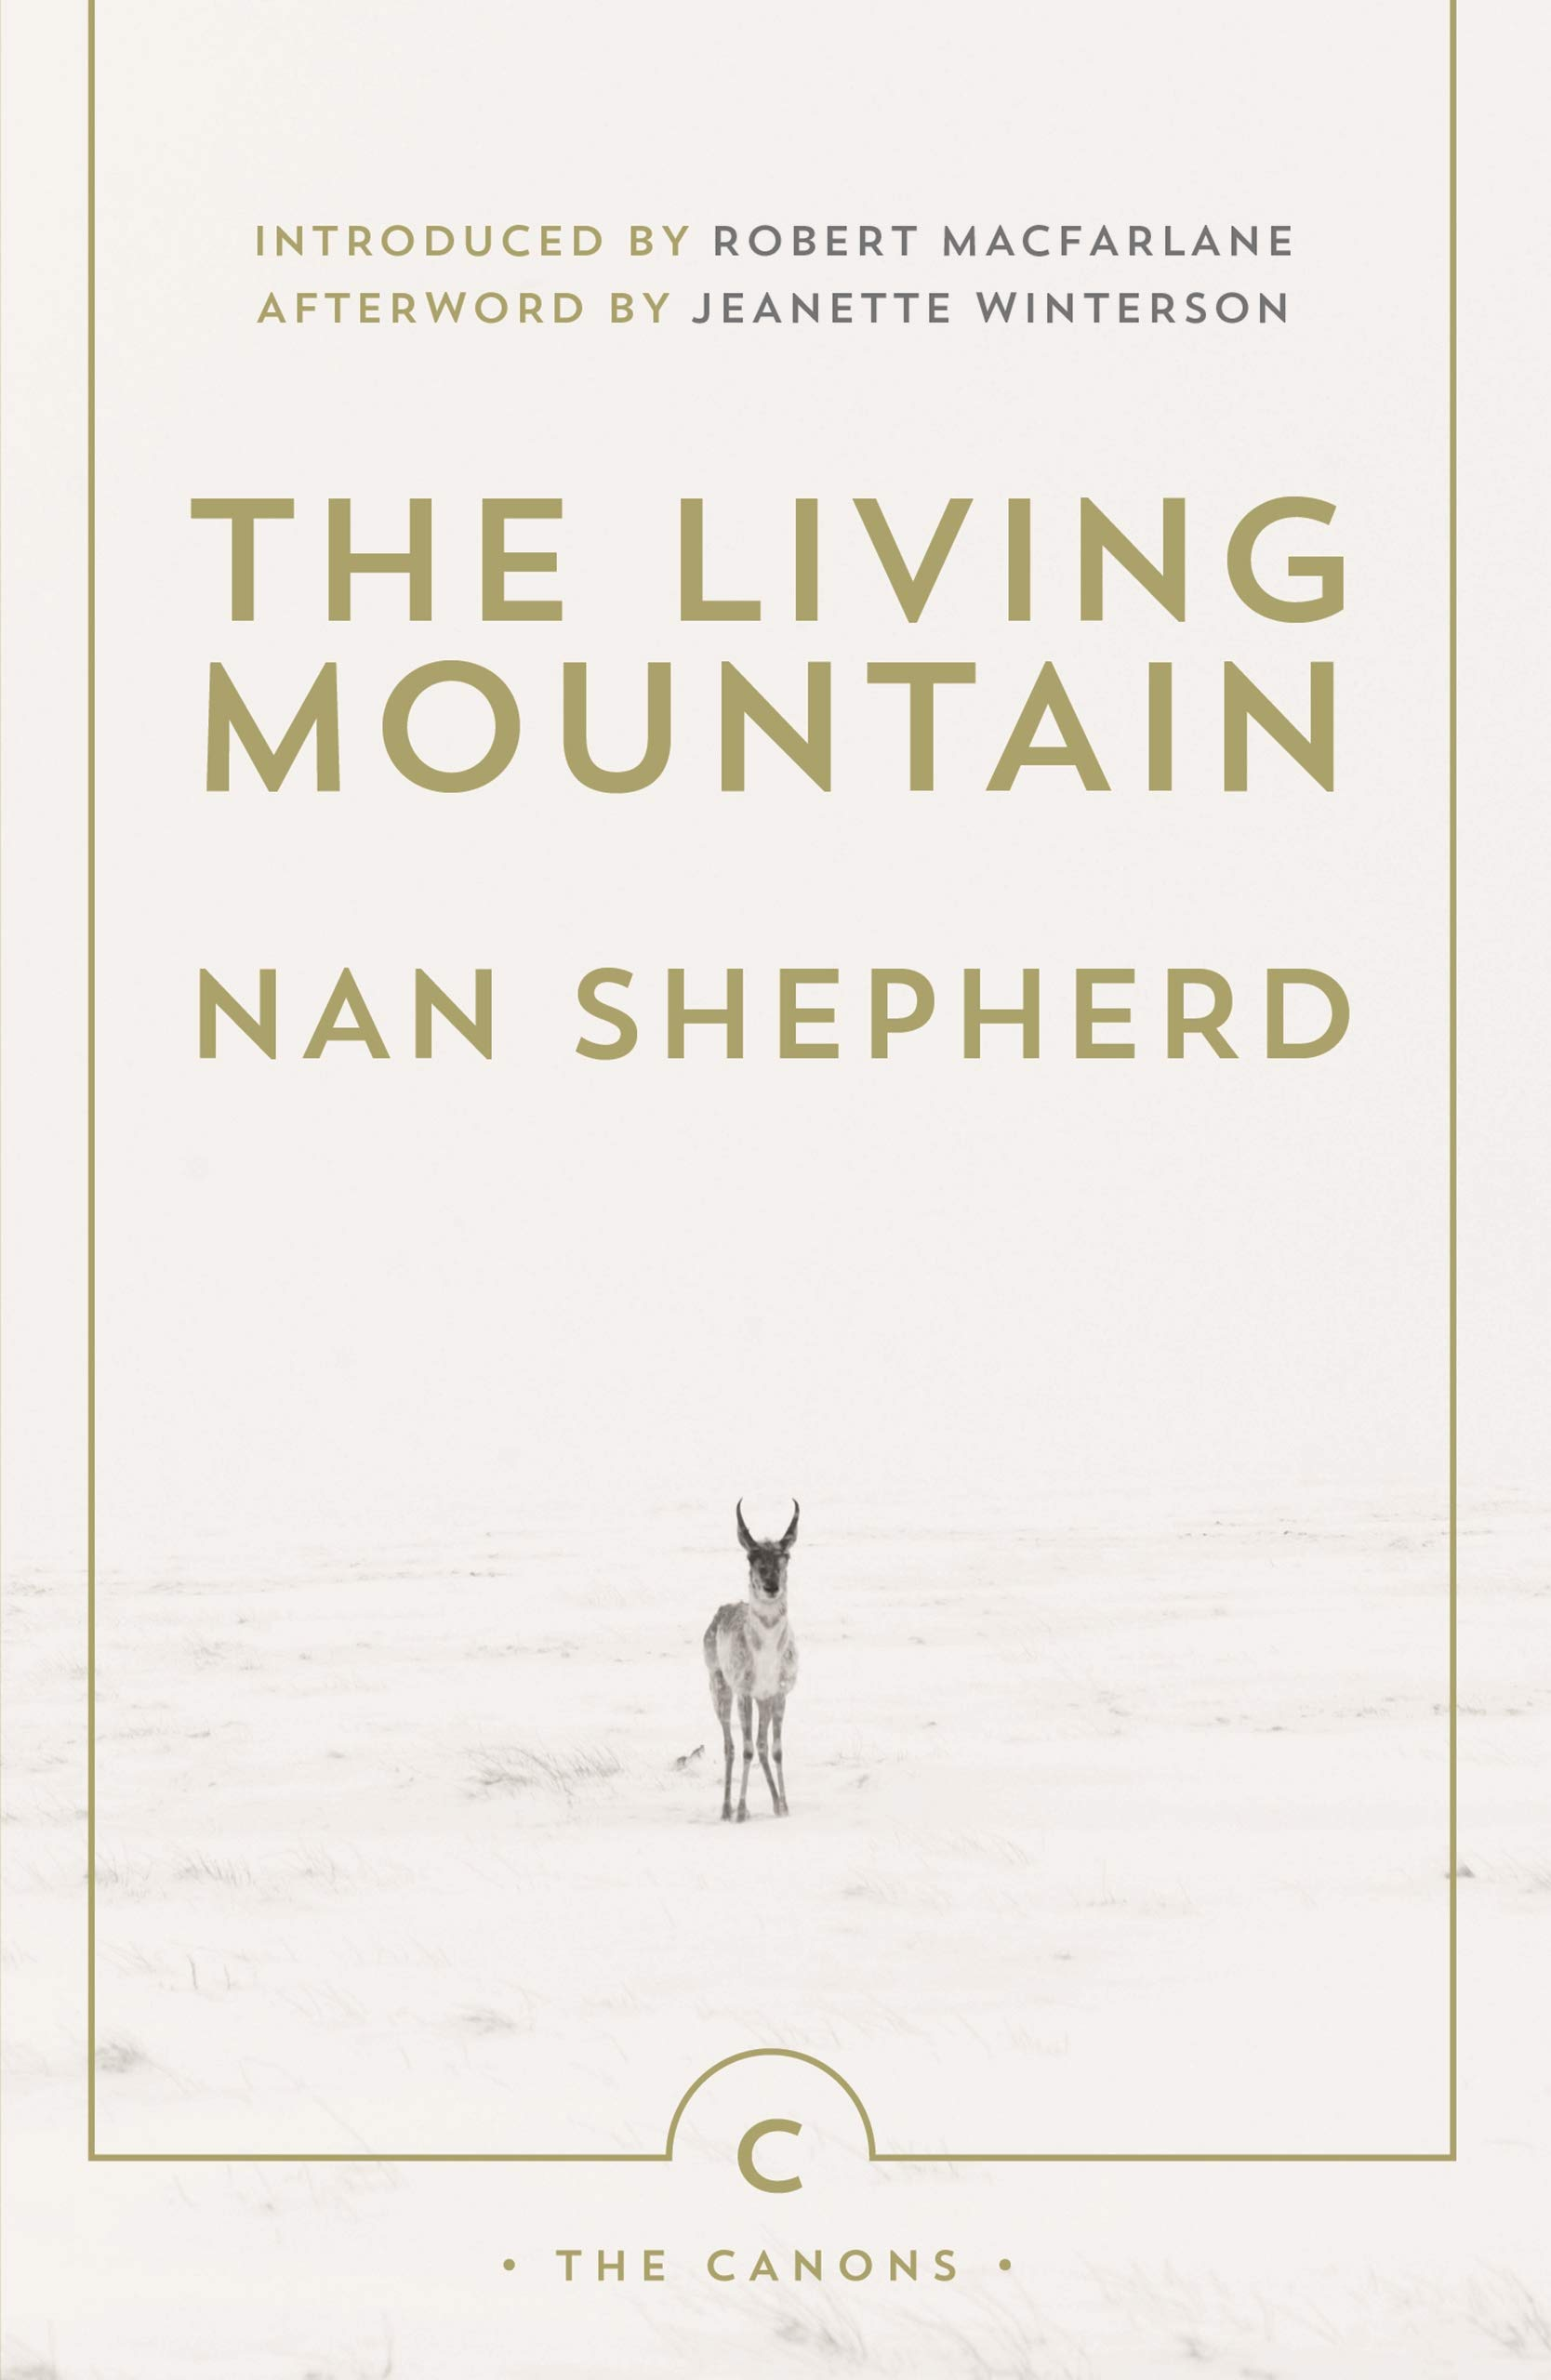 thelivingmountain-nan-shepherd.jpg